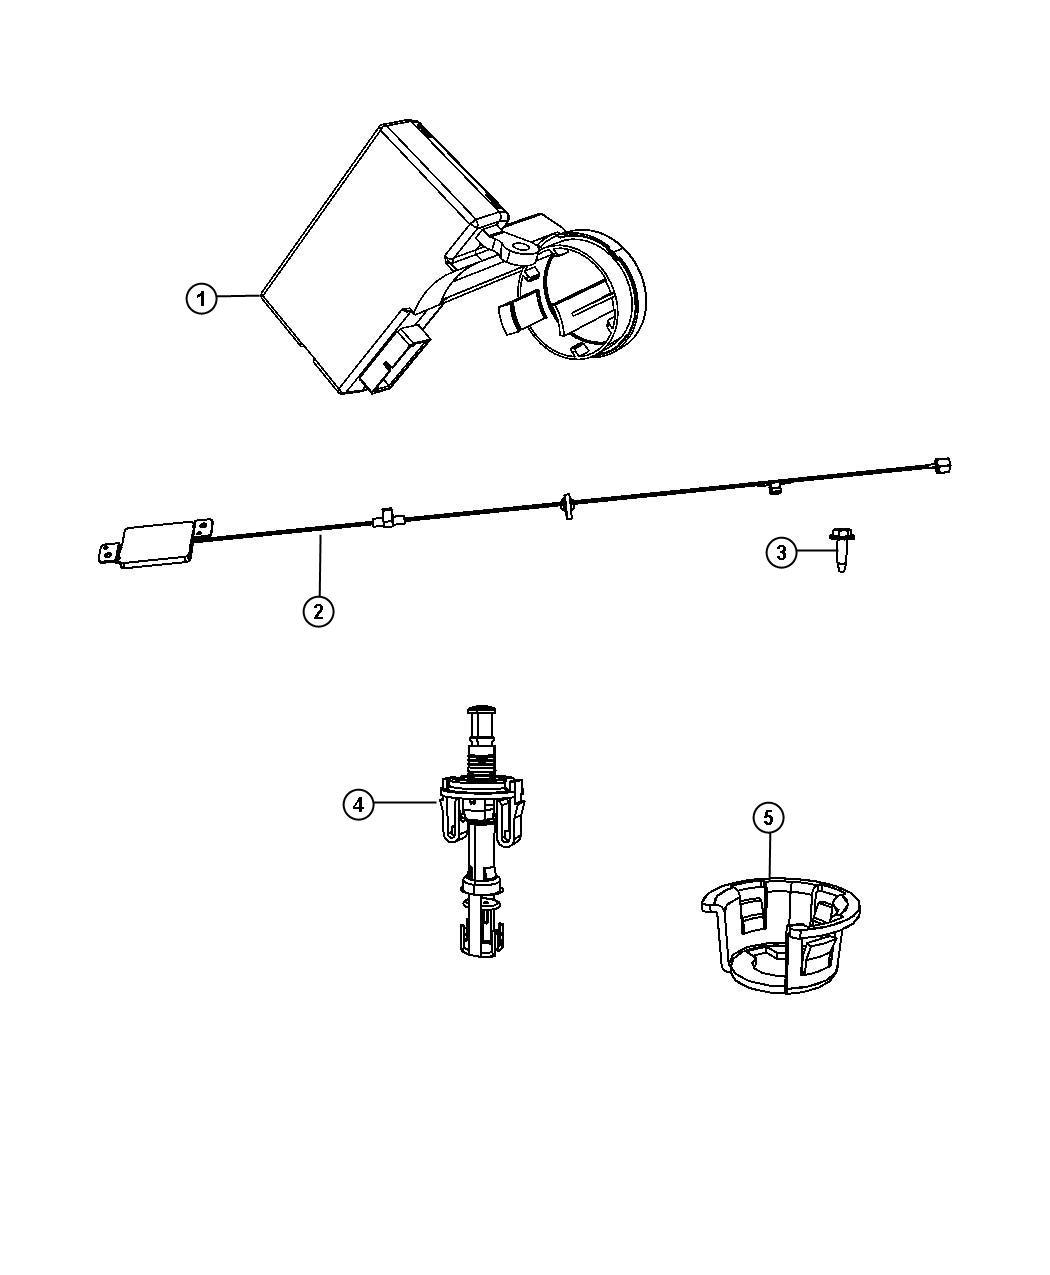 Valet Remote Wiring Diagram. . Wiring Diagram on